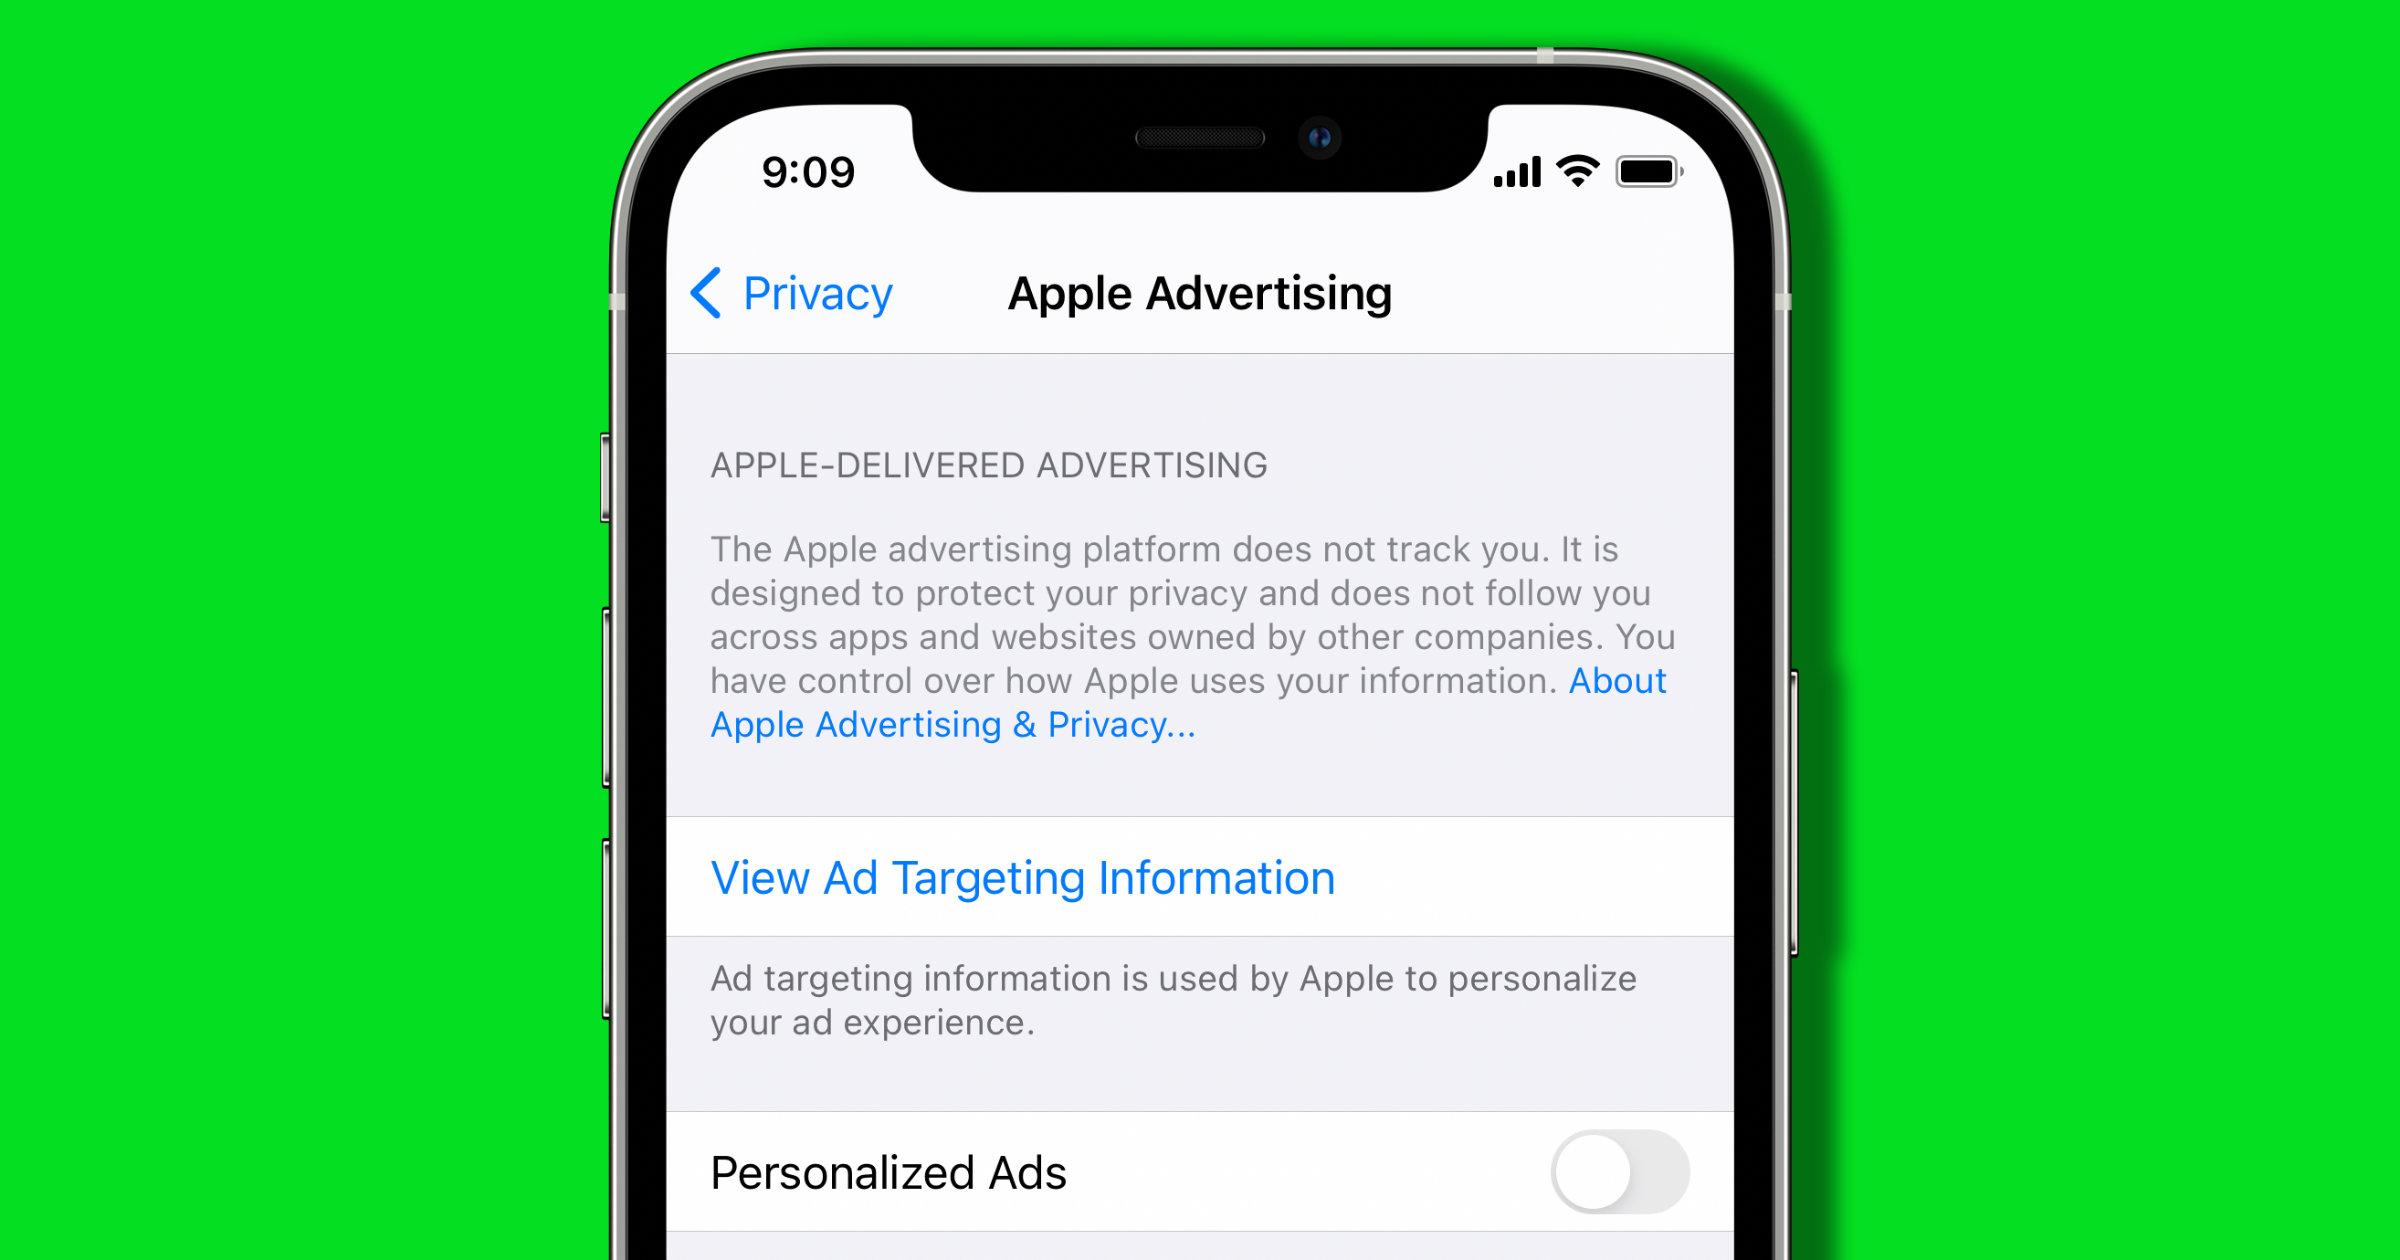 apple advertising iphone setting